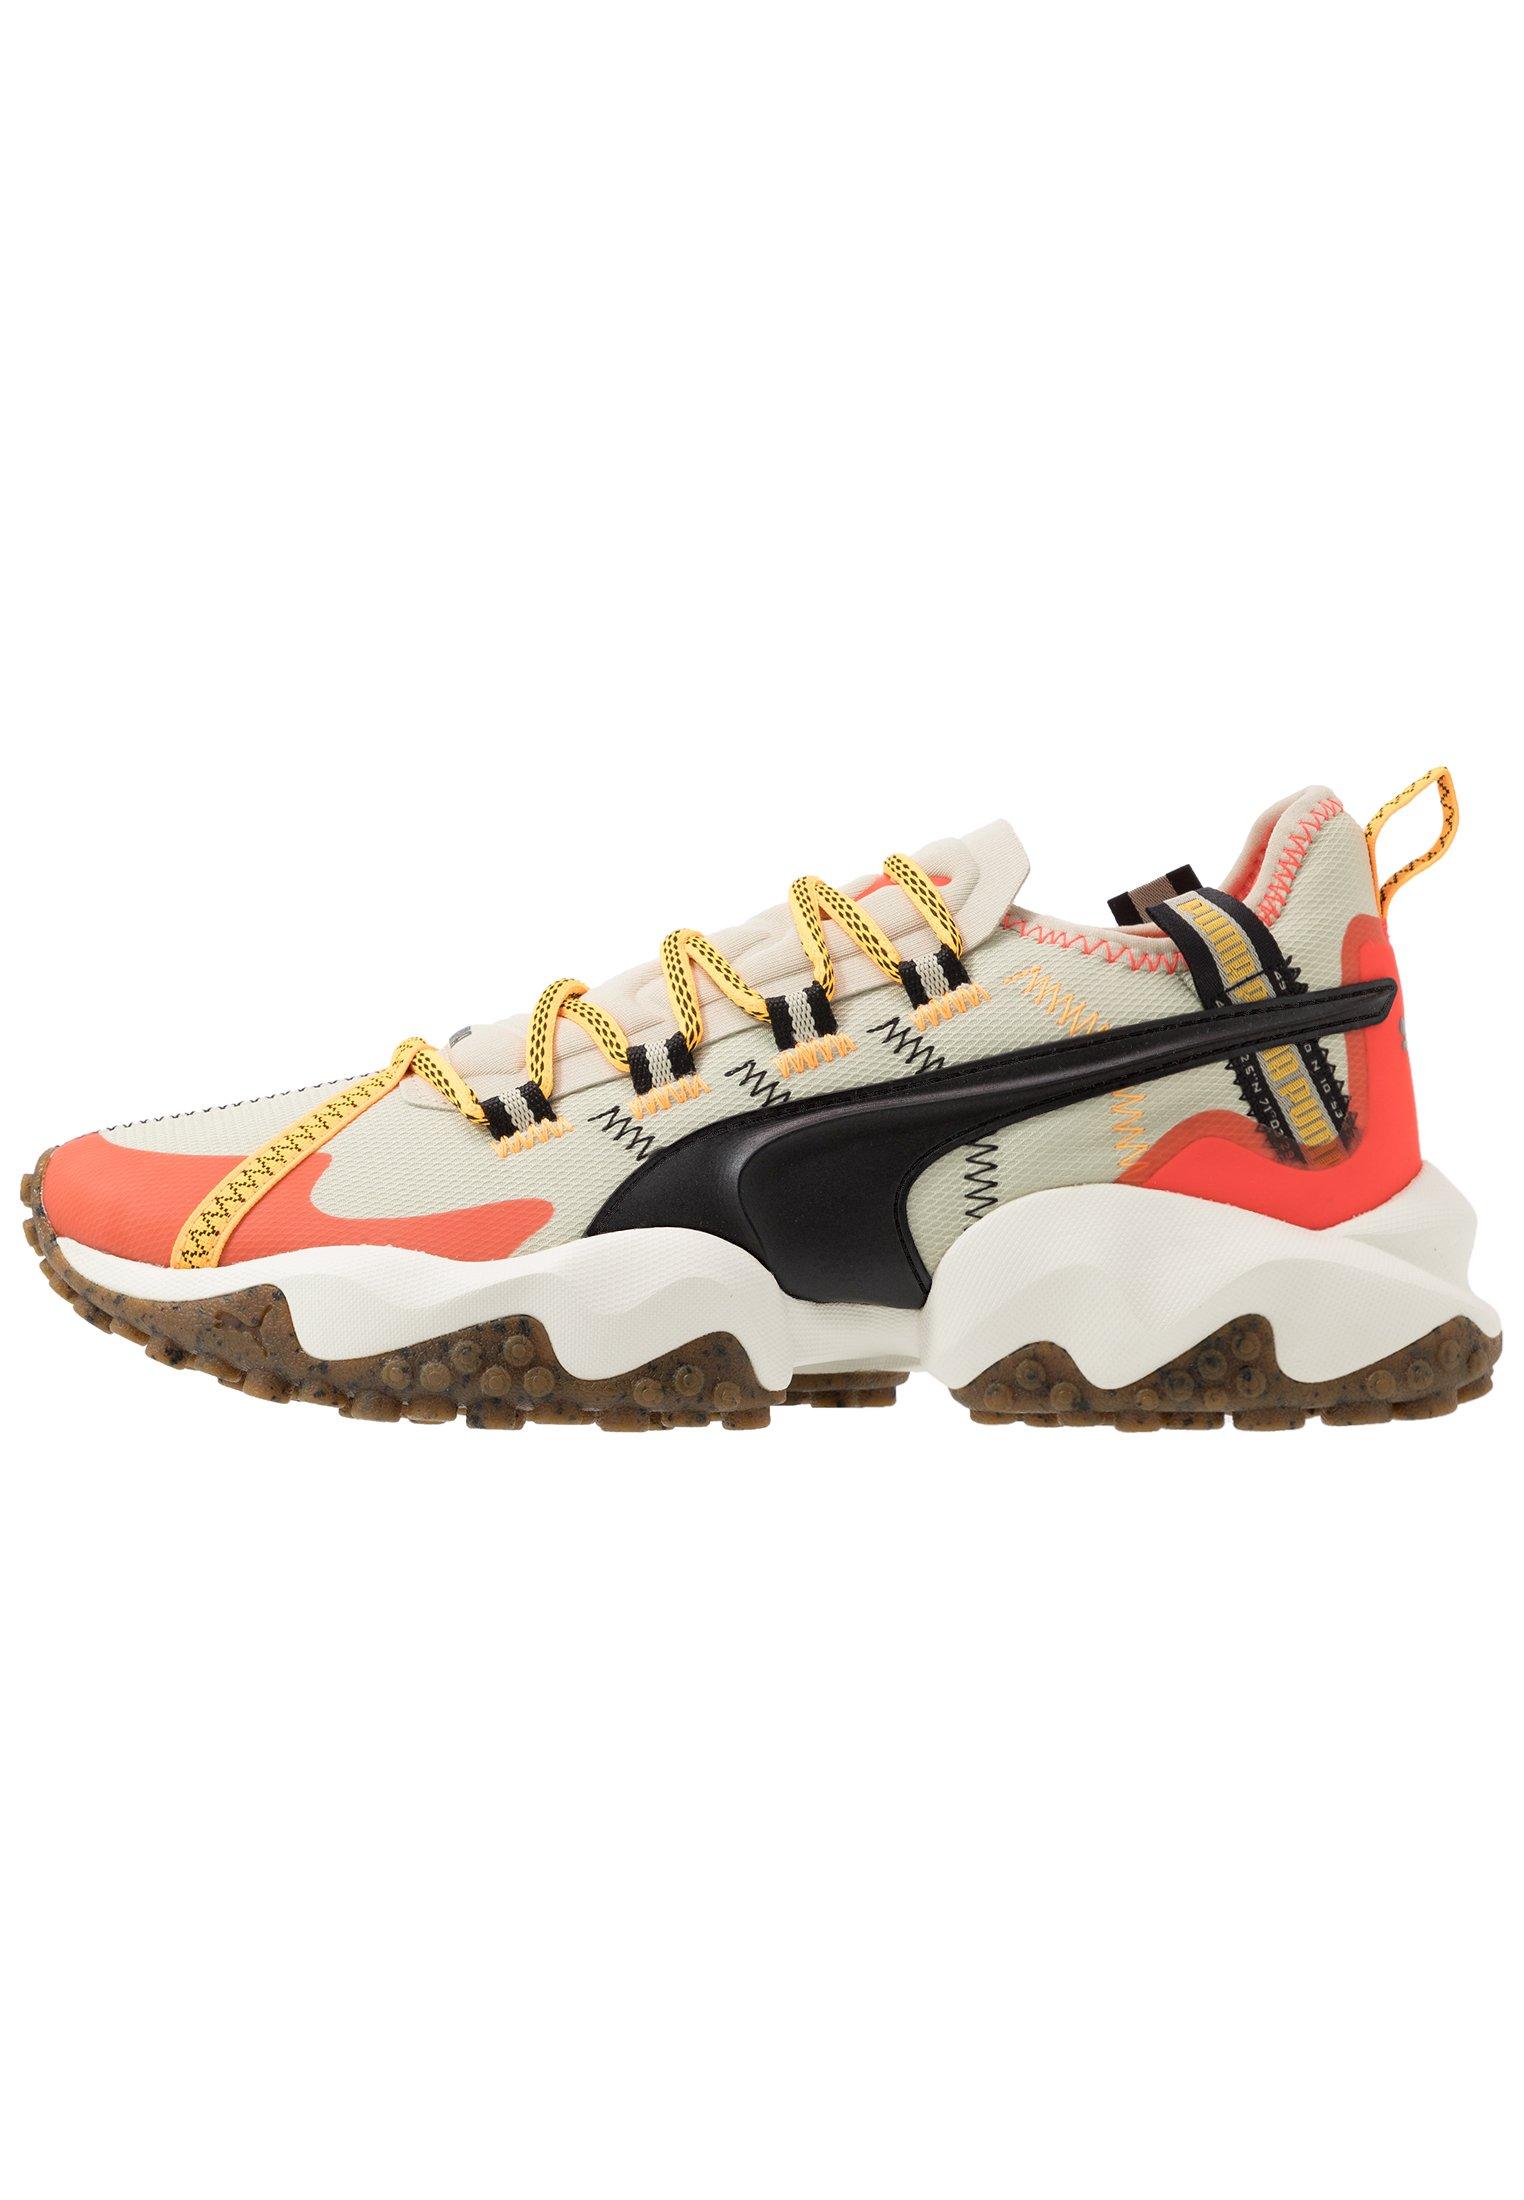 Puma ERUPT TRL - Chaussures de running - overcast/nrgy red/beige ...